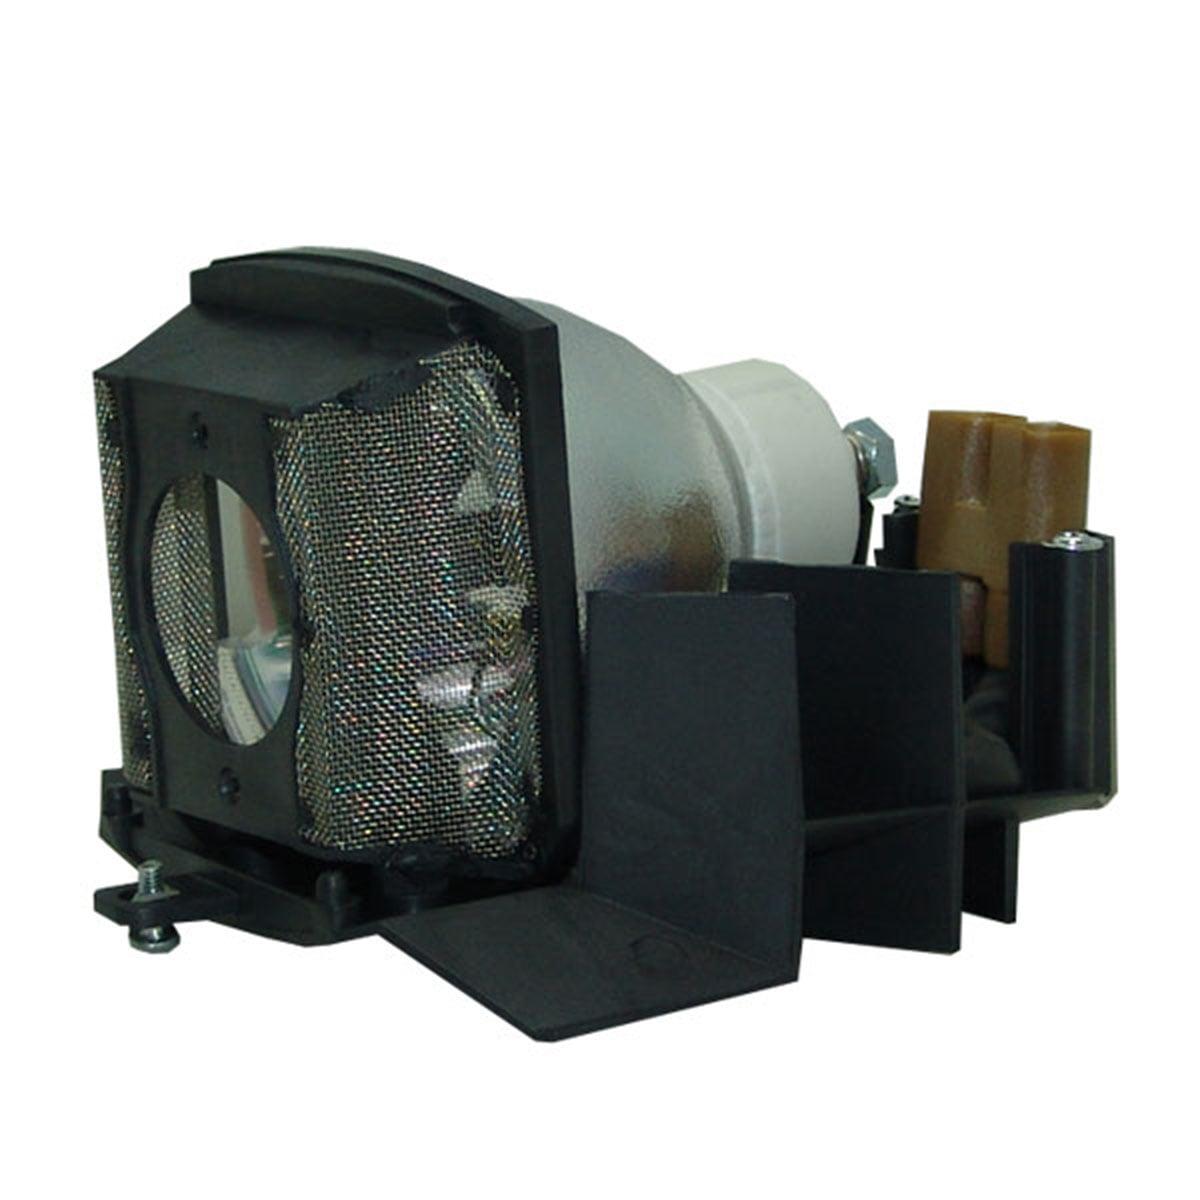 Lamp Housing For PLUS U5132 Projector DLP LCD Bulb